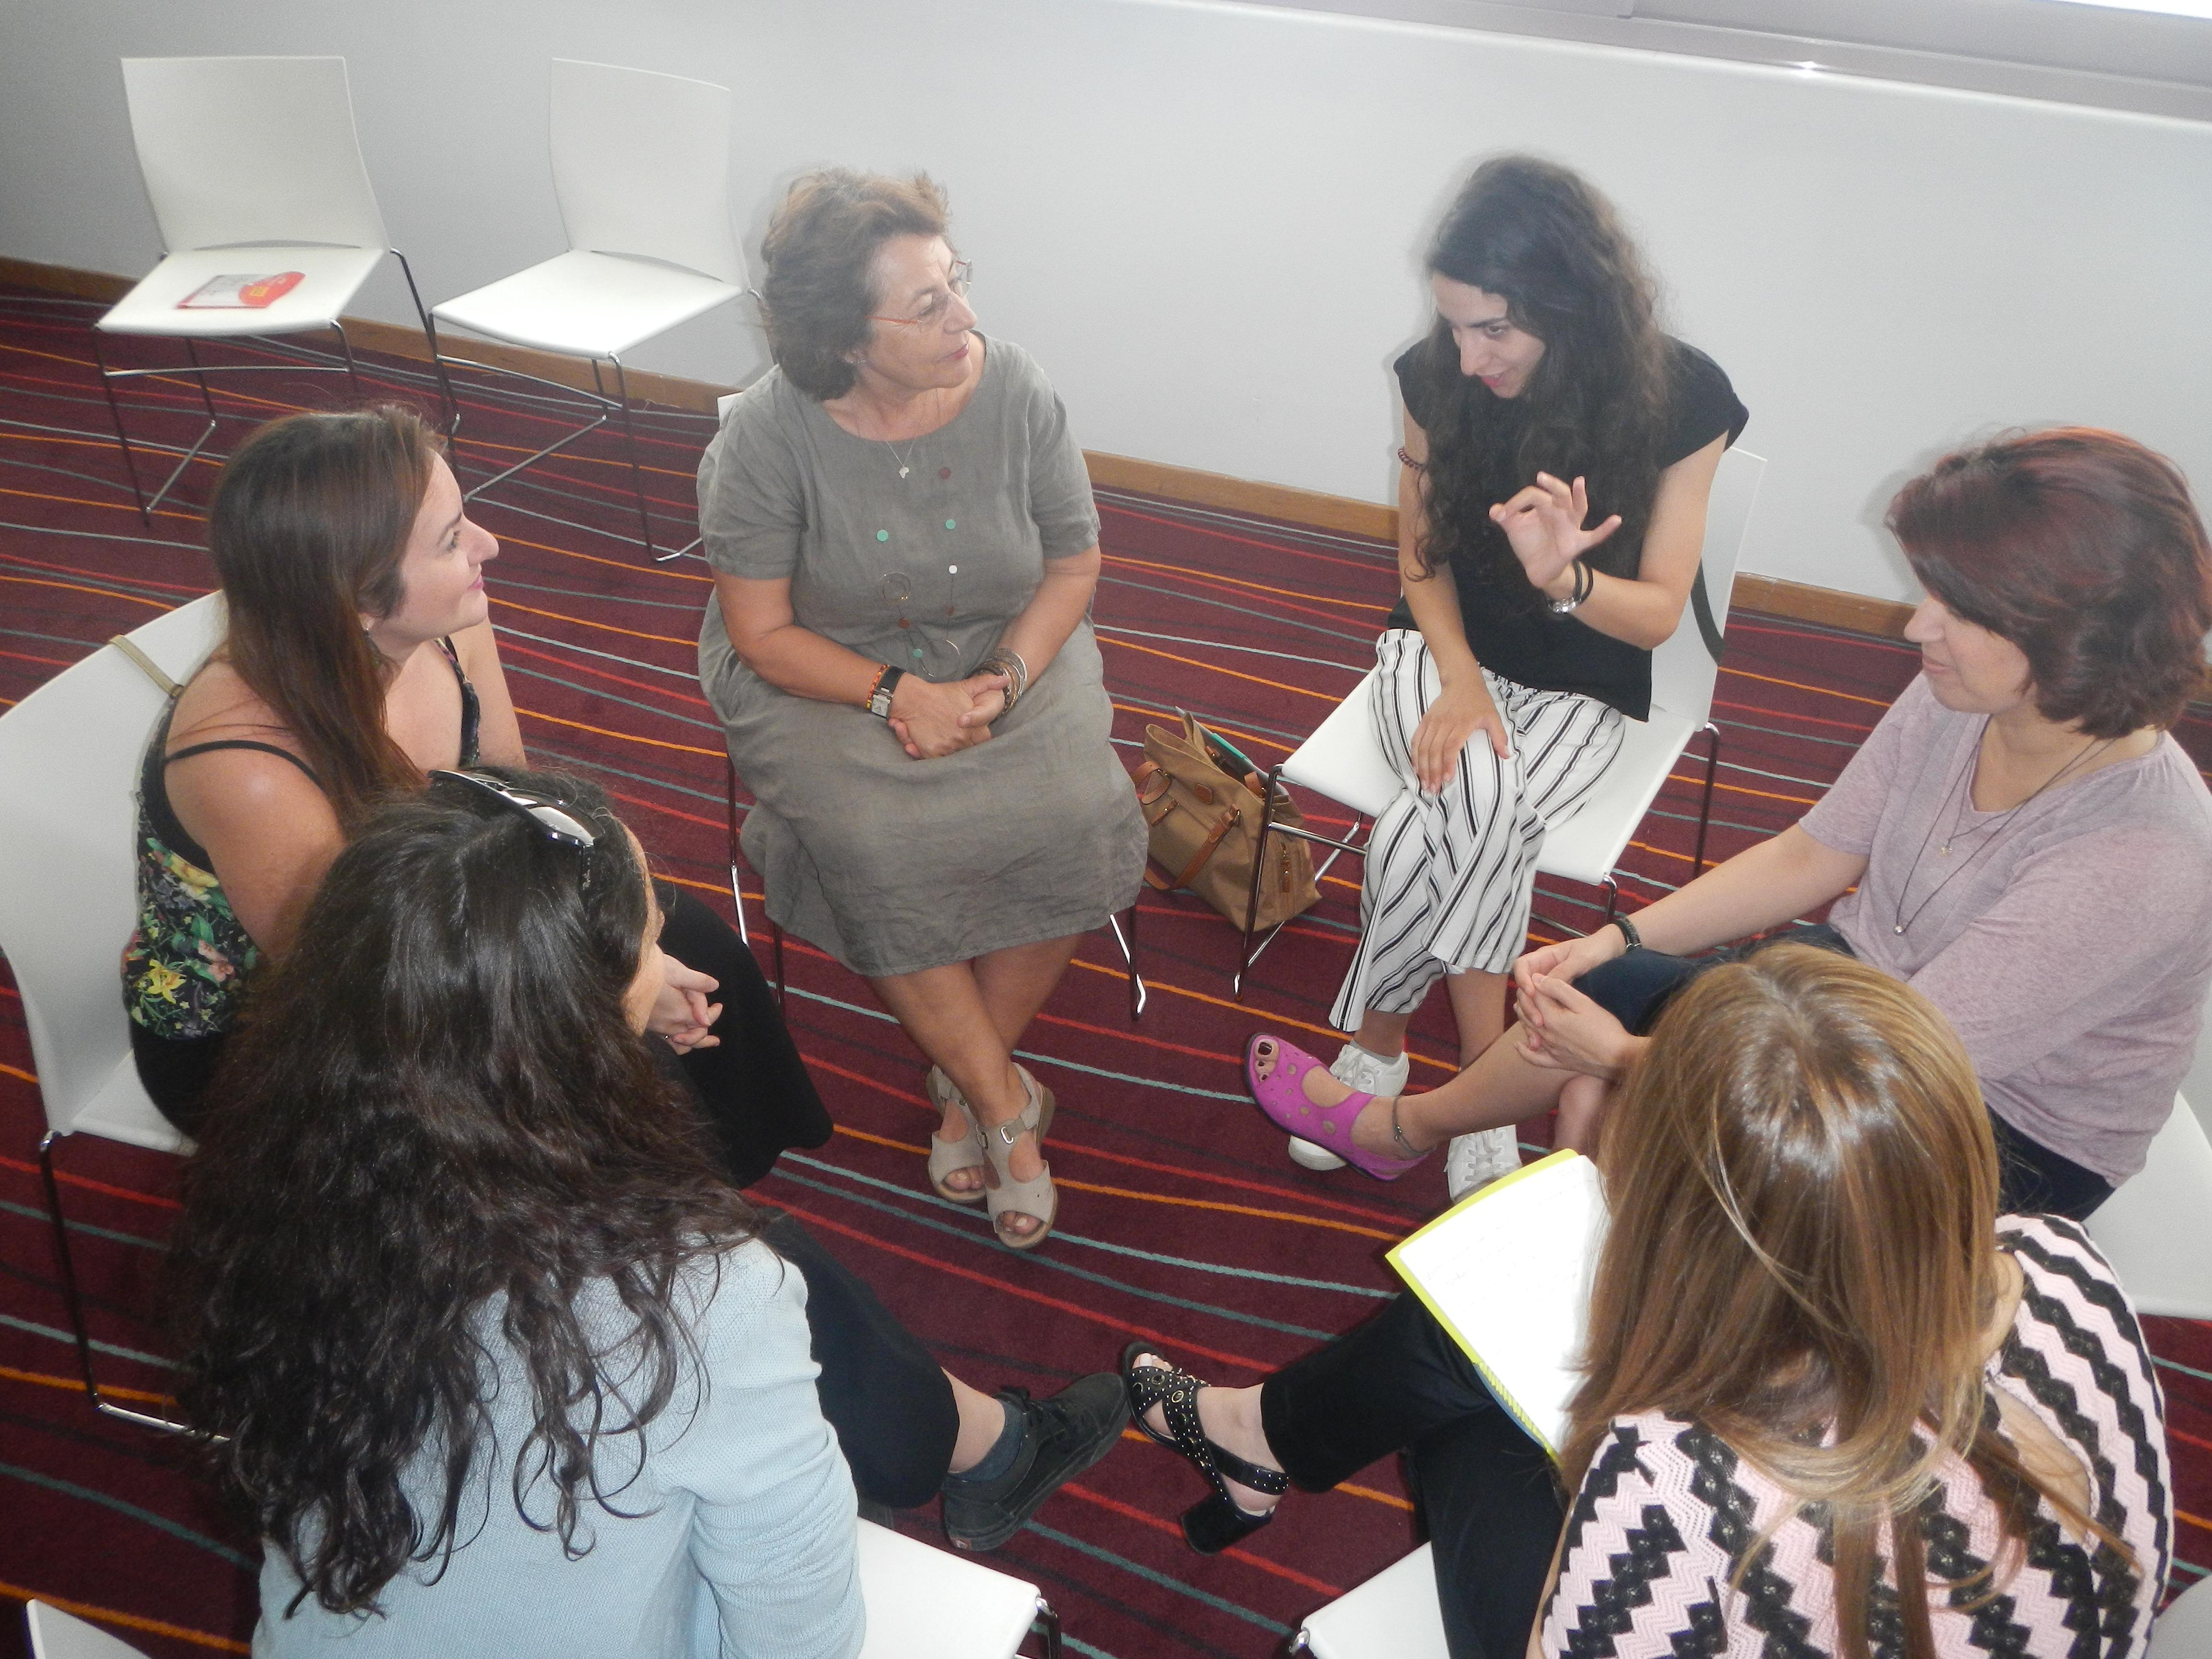 CHANGING YOUTHstories: Εφαρμόζοντας τη Συστημική-Διαλεκτική Προσέγγιση στην υποστήριξη Νέων σε Κίνδυνο